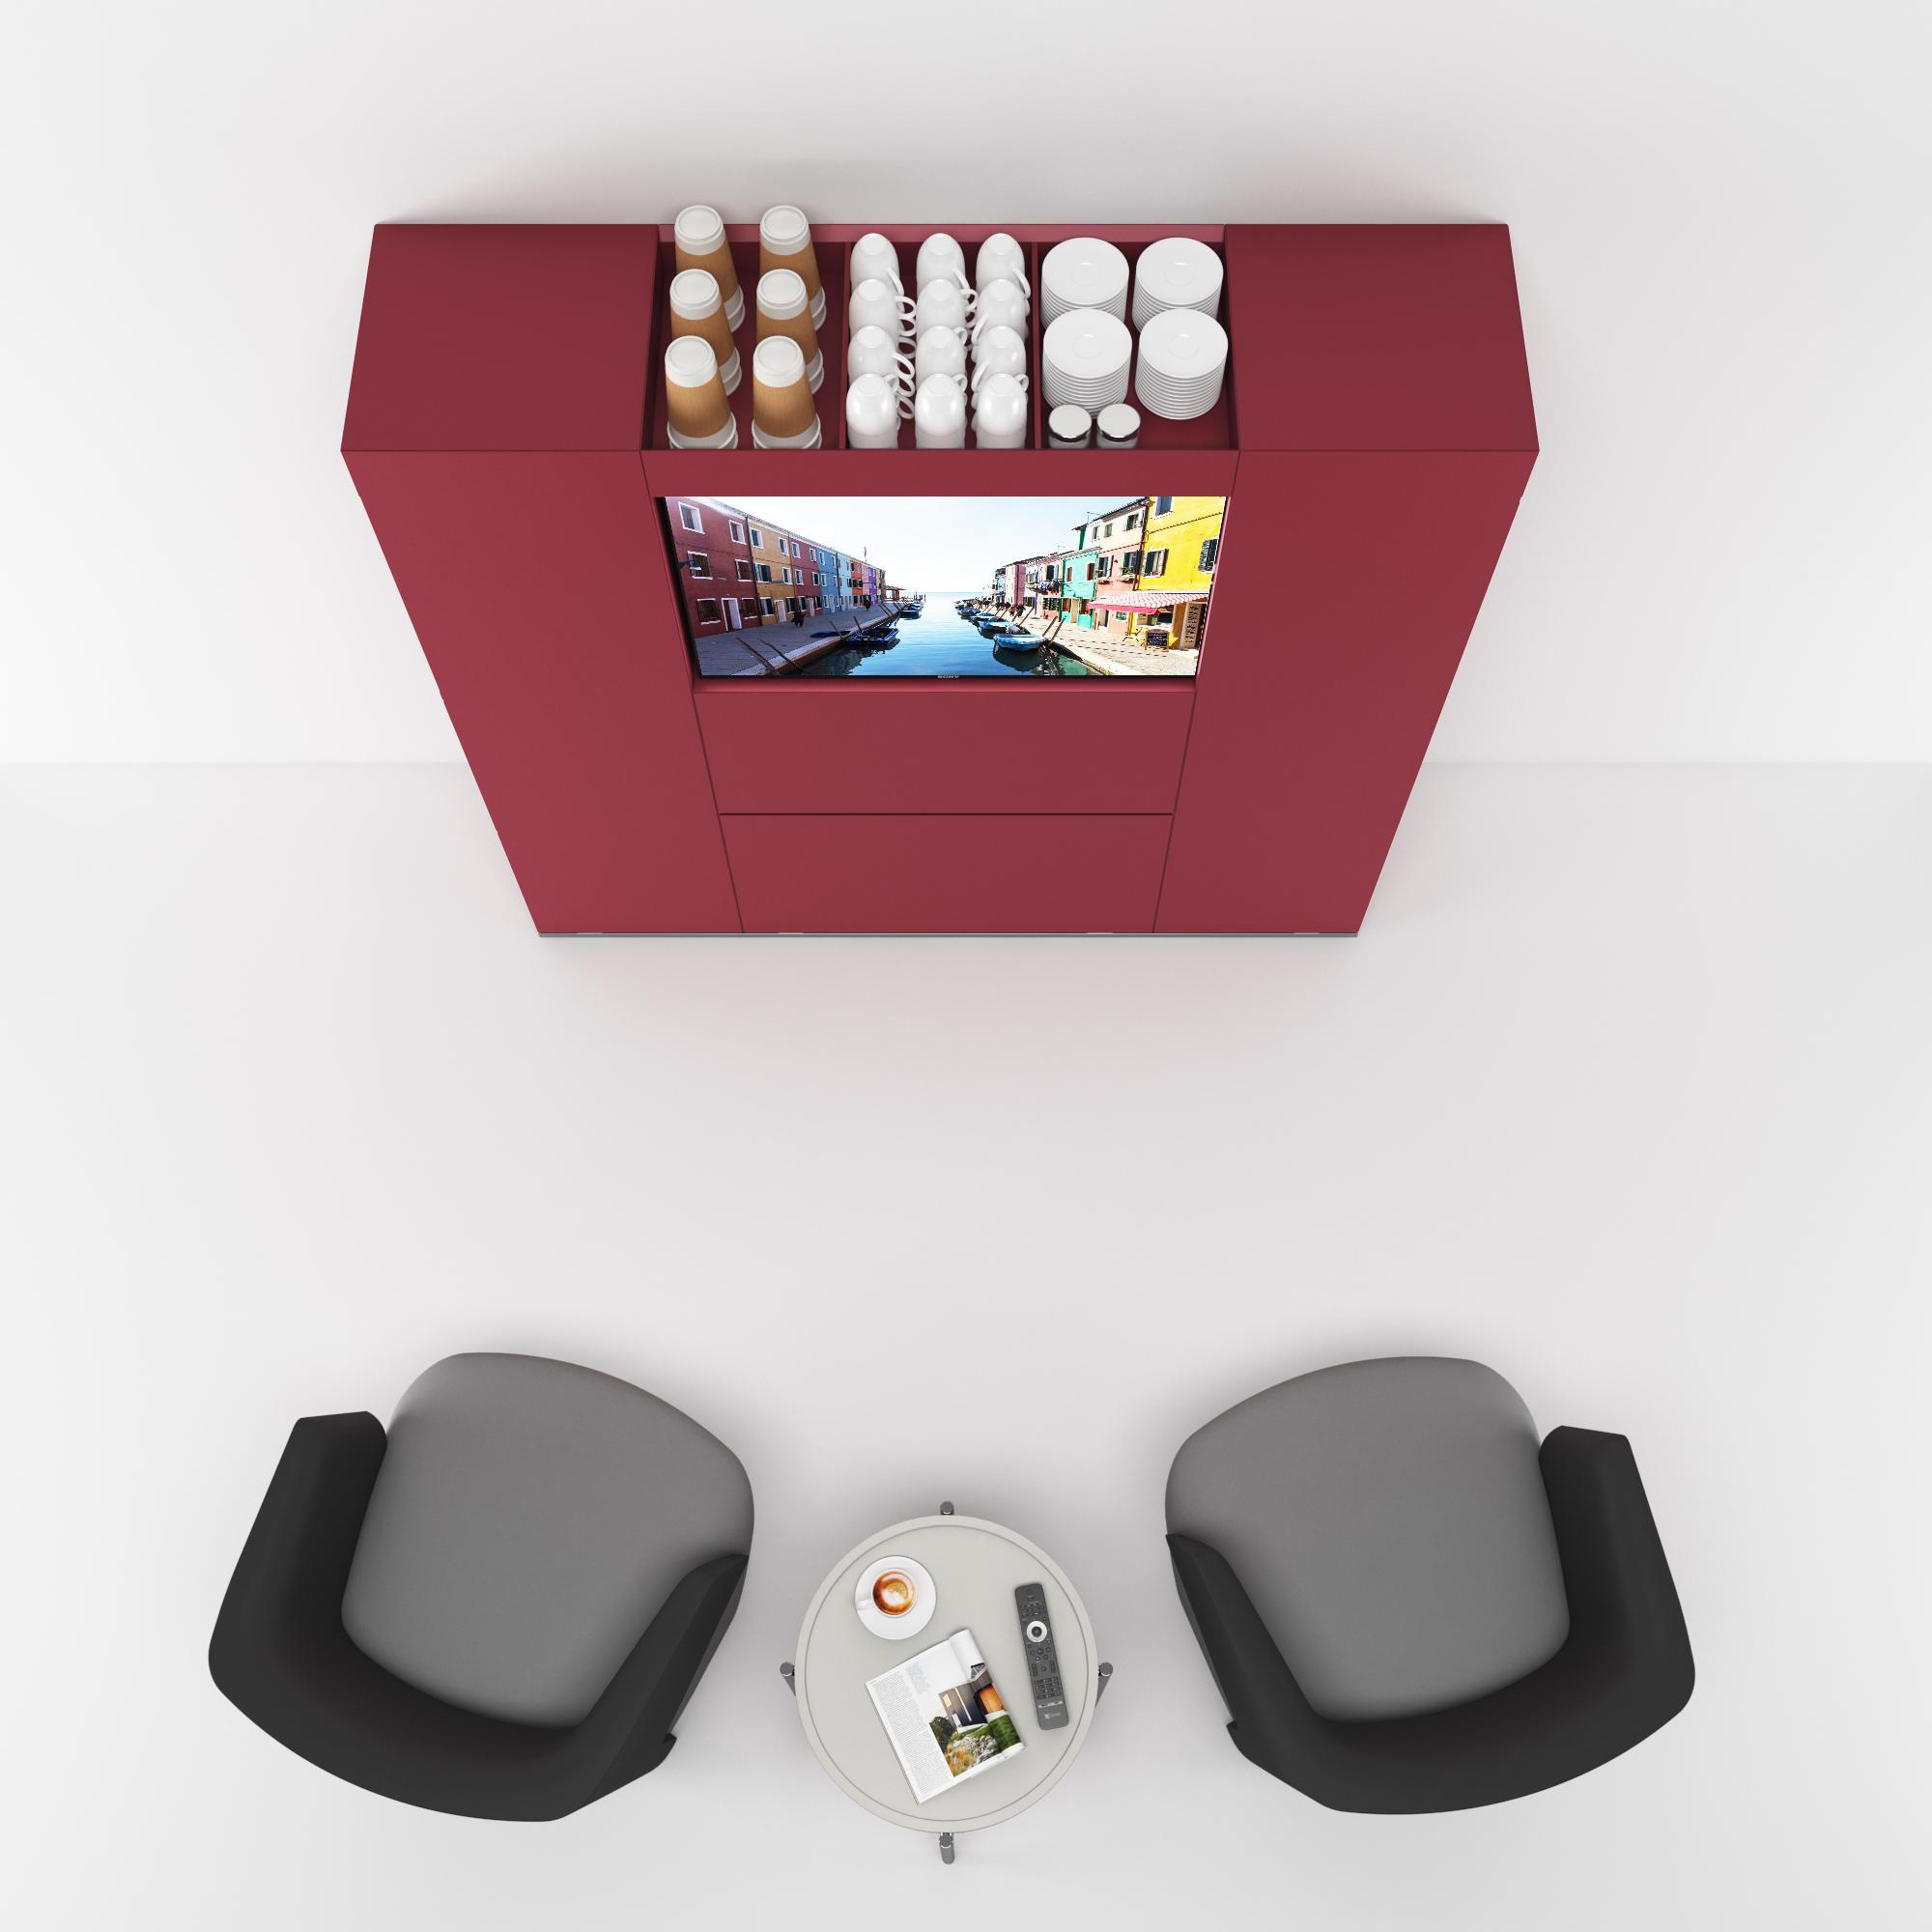 03_Estel_Coffice_Isole H 150_Isola Lounge